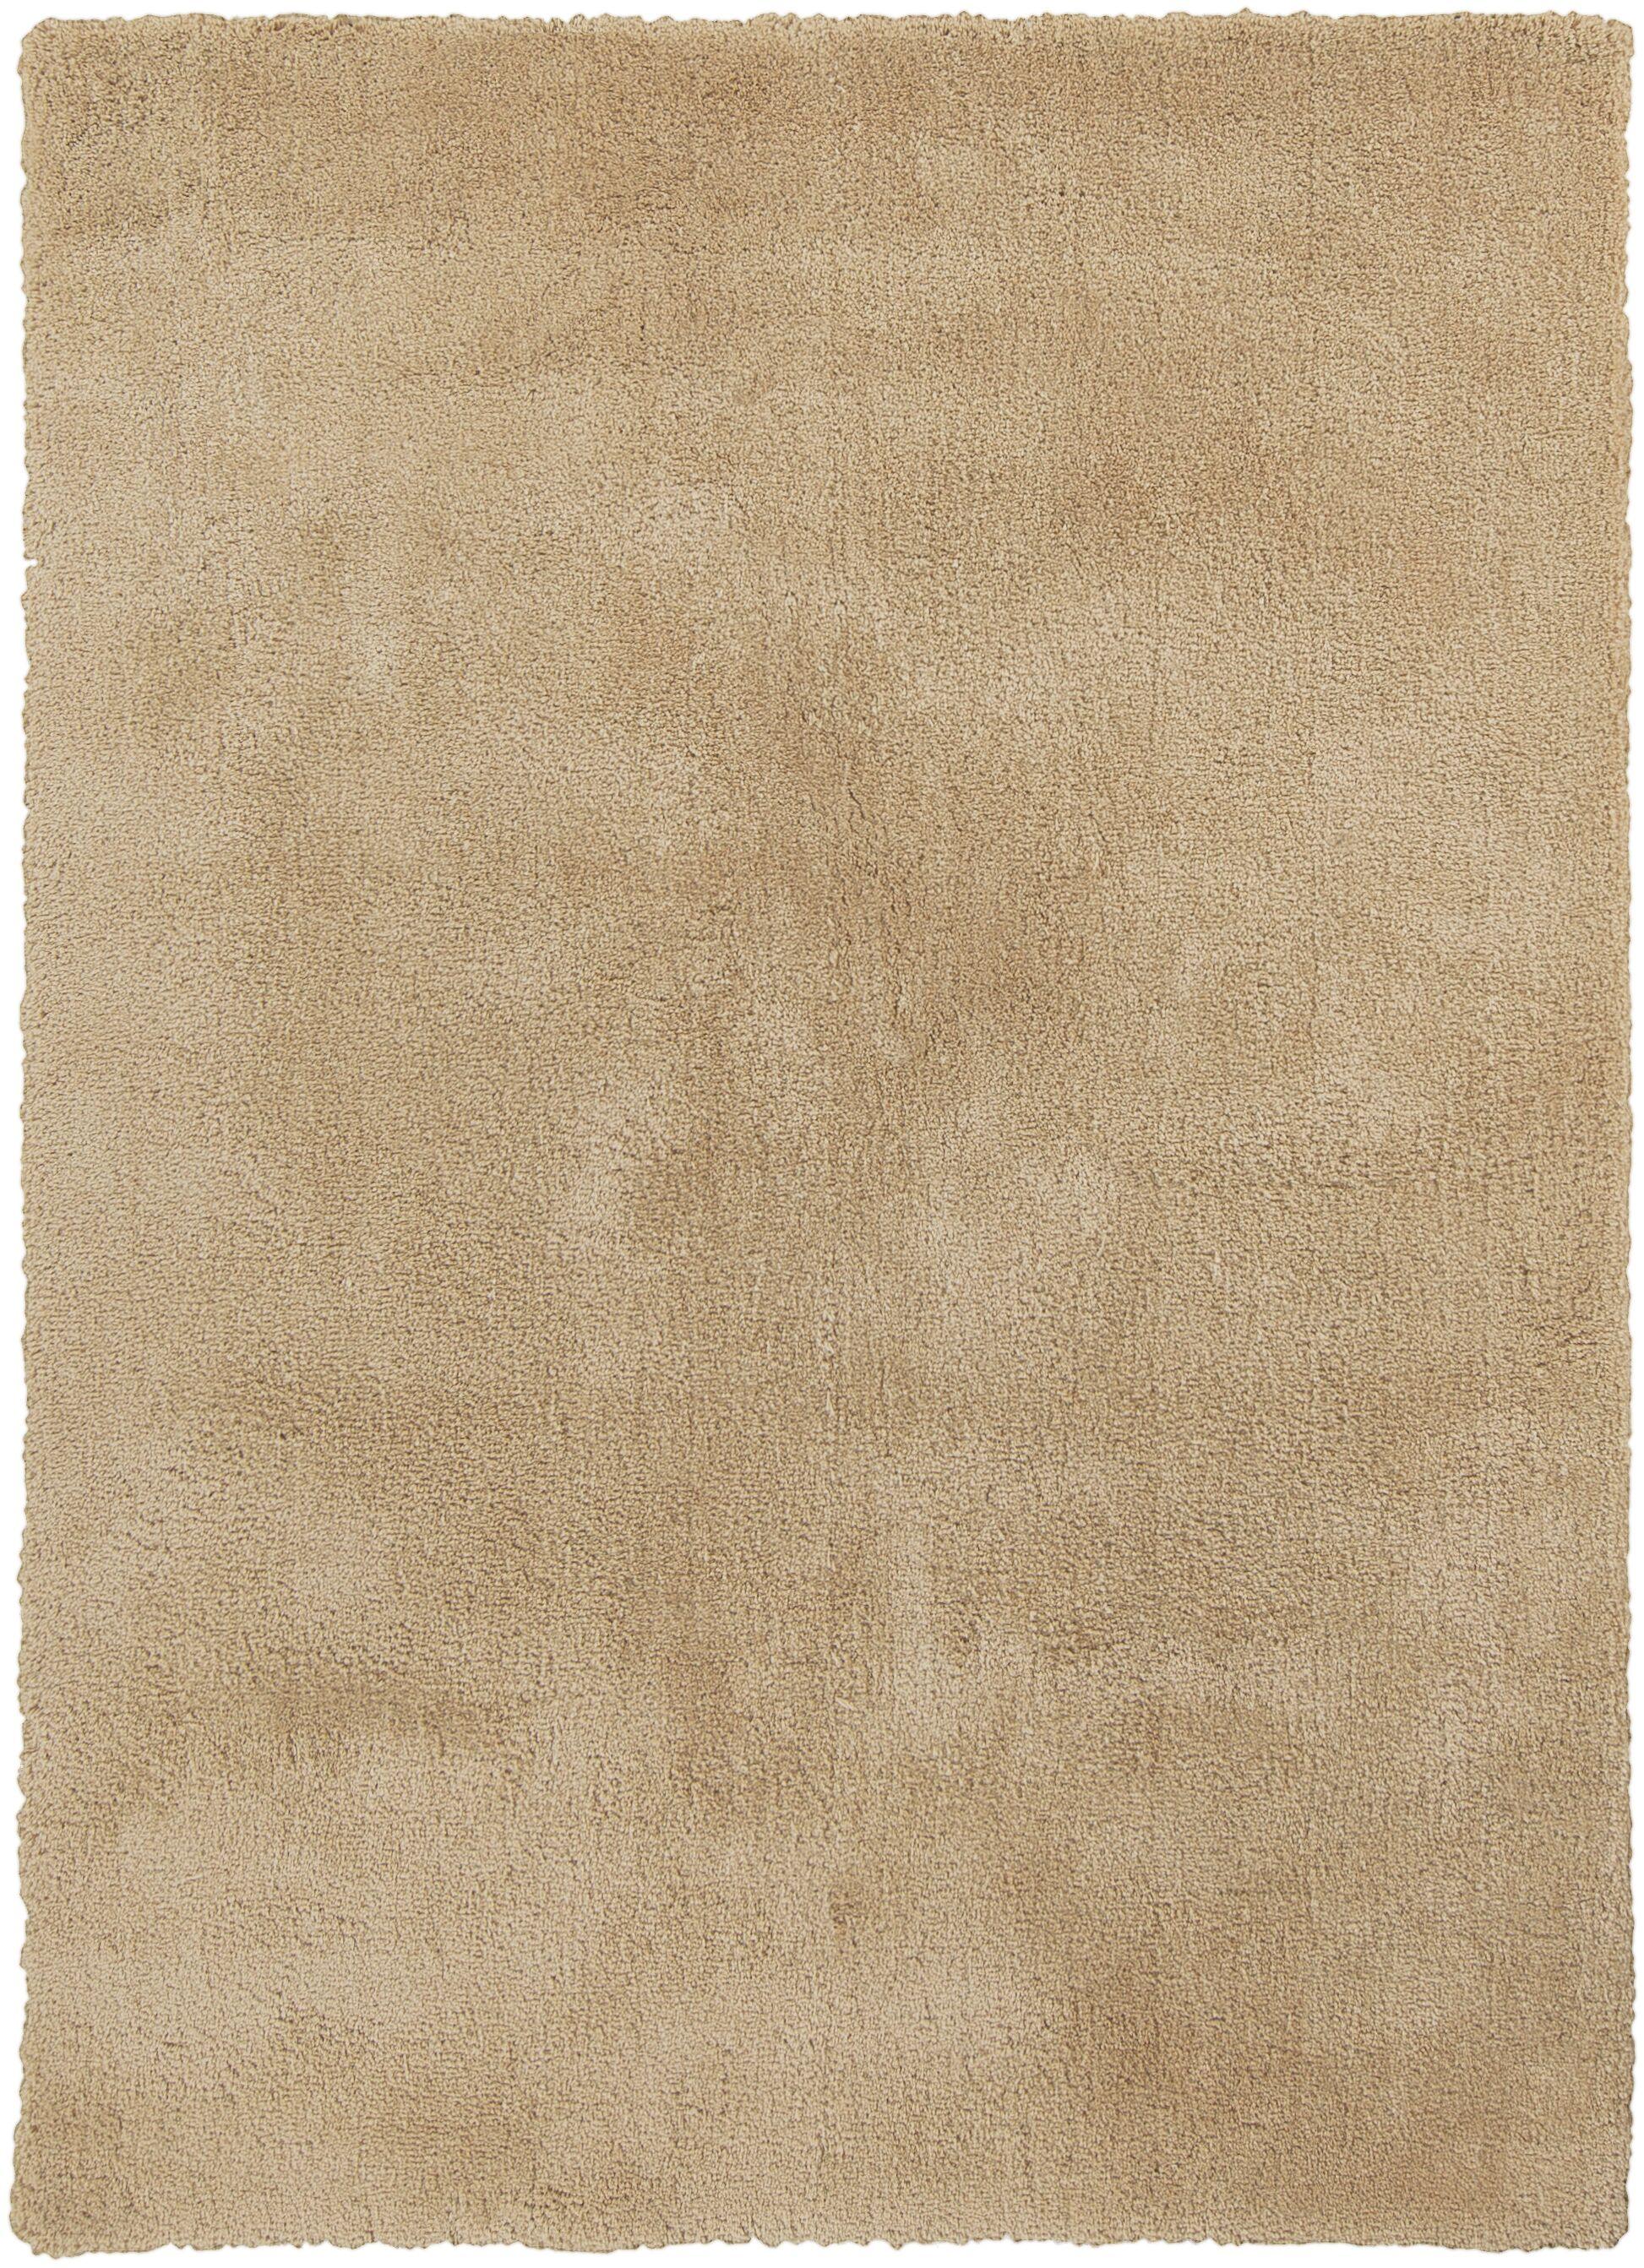 Braun Blond Area Rug Rug Size: Rectangle 9' x 13'